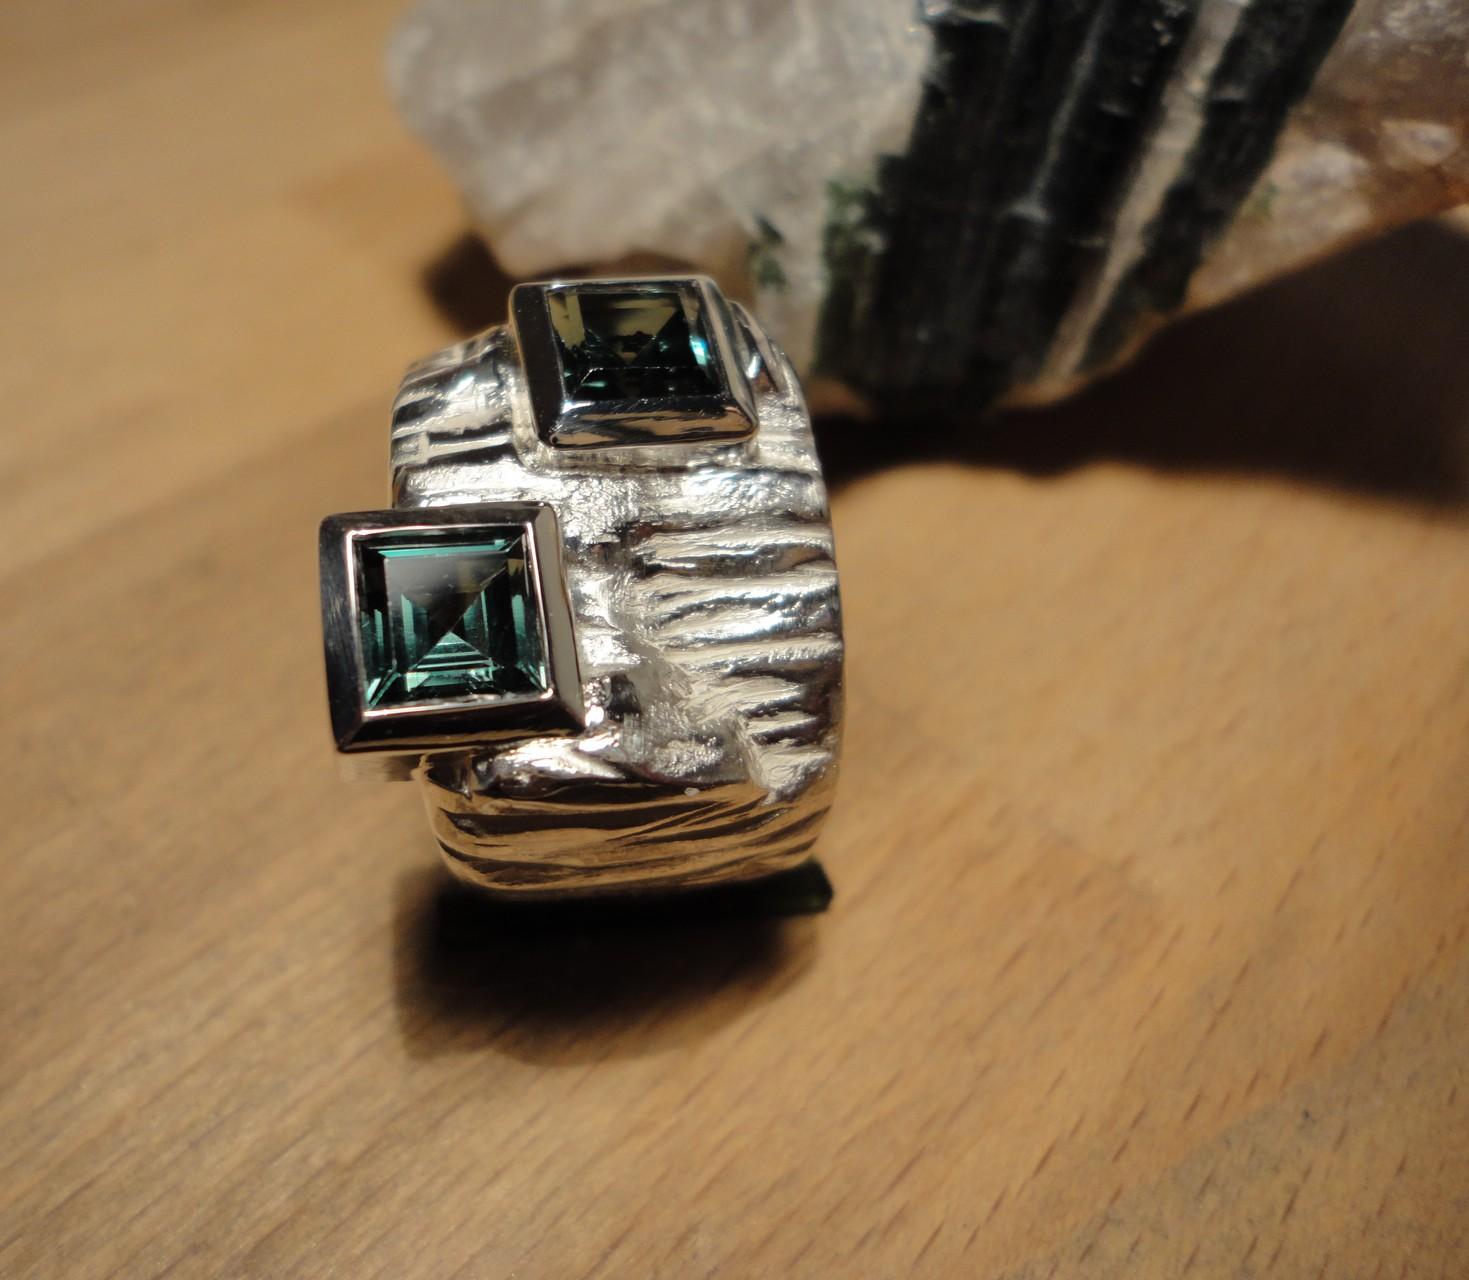 Silberring mit zwei geschliffenen Turmalinen (925 Sterlingsilber) Preis: CHF 800.-